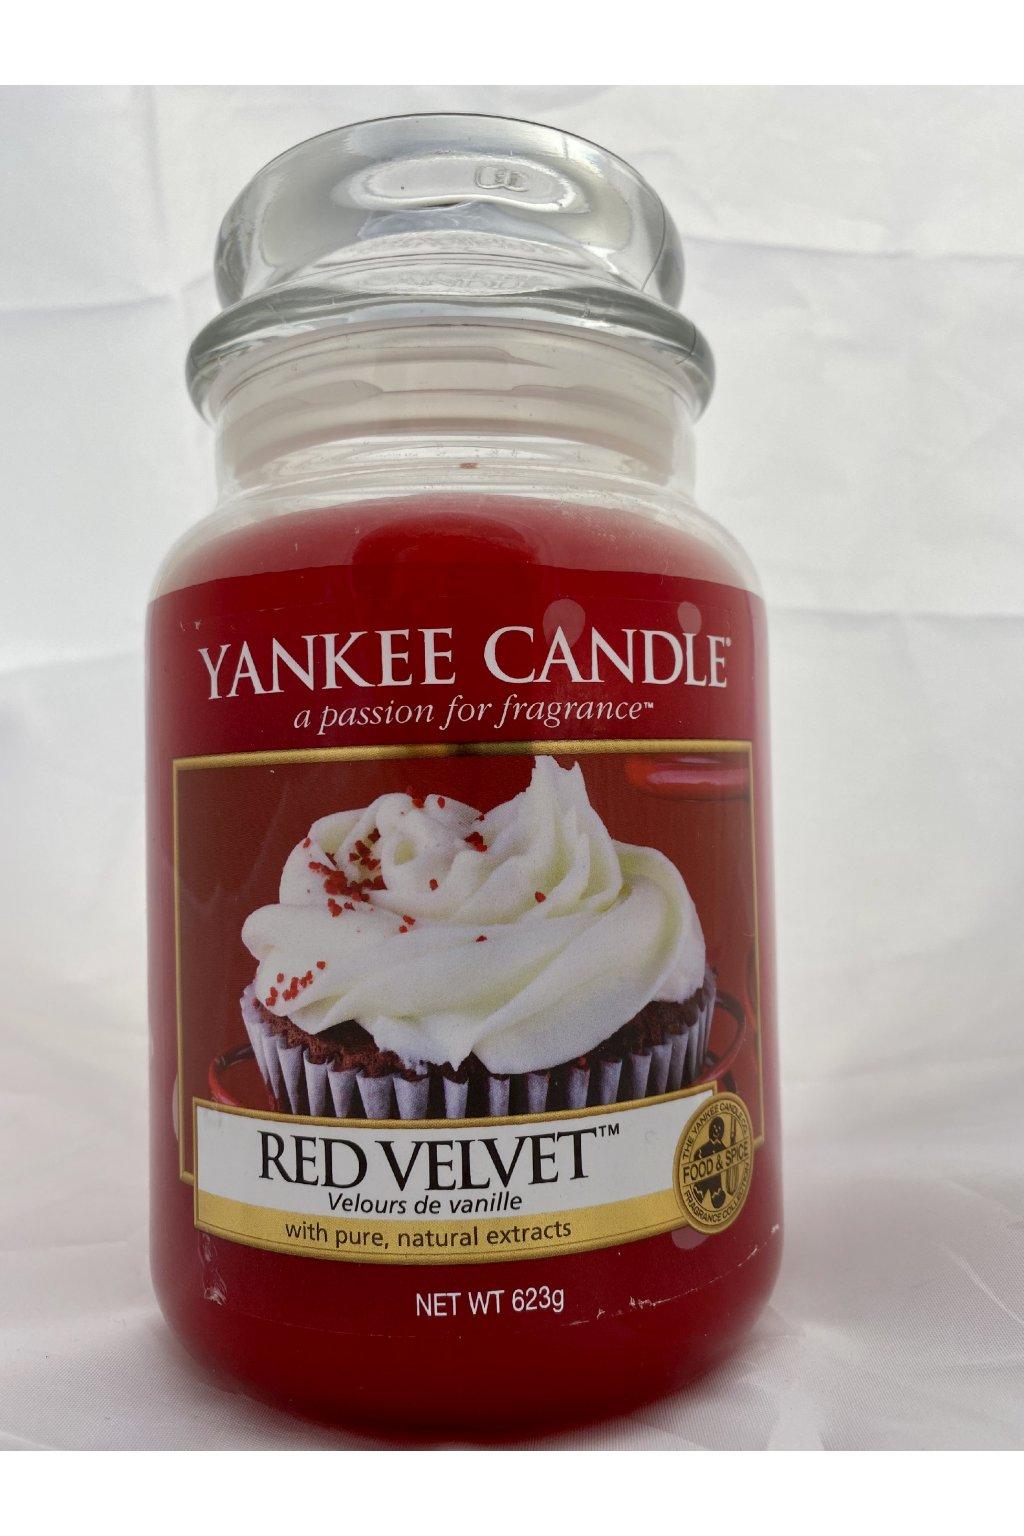 Yankee Candle Red Velvet 623g 2015 USA